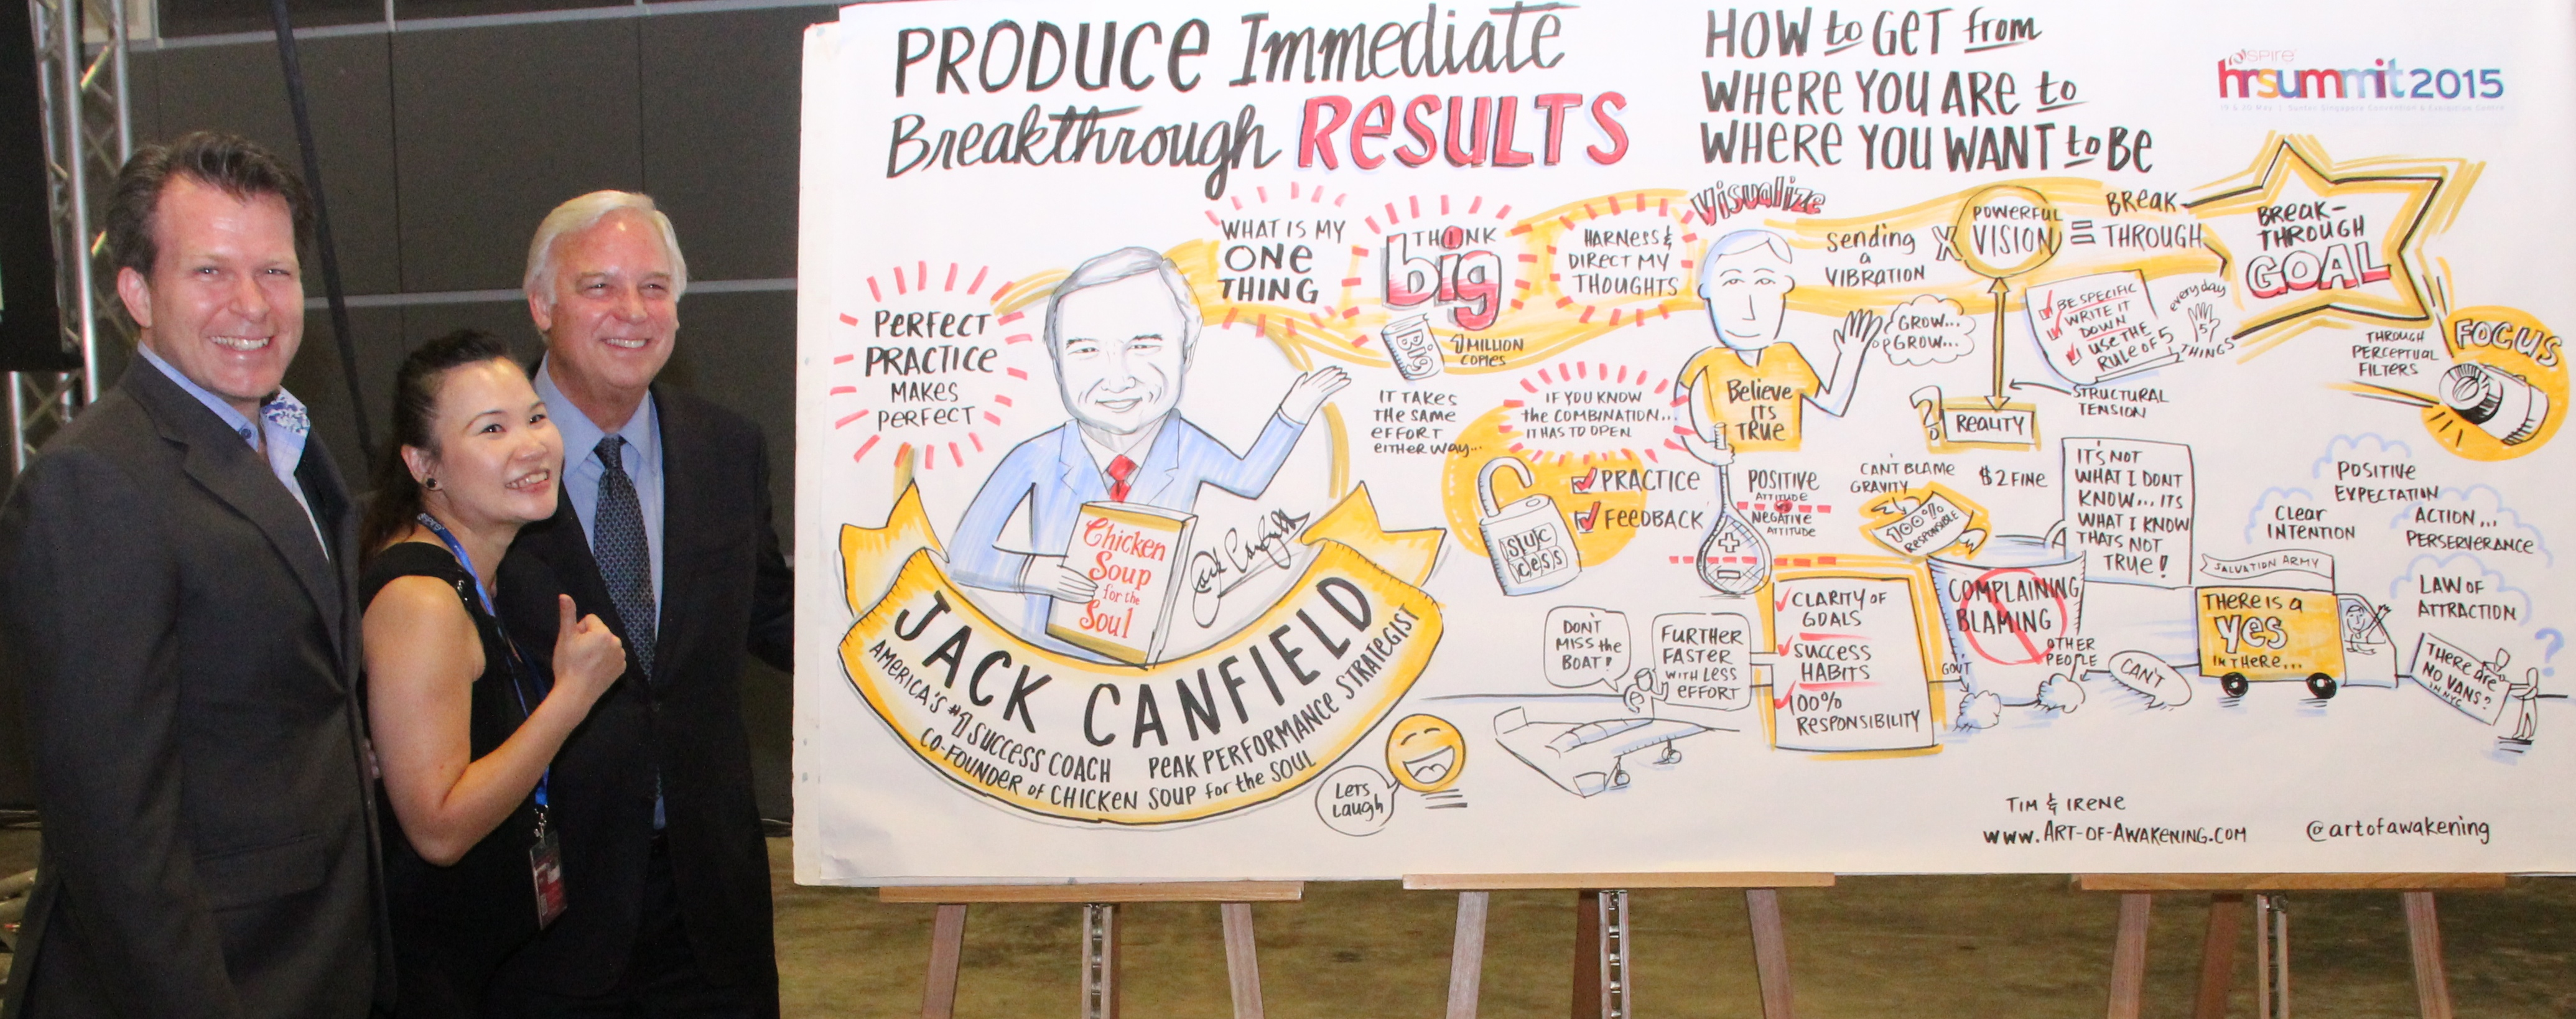 HR Summit 2015 - Jack Canfield